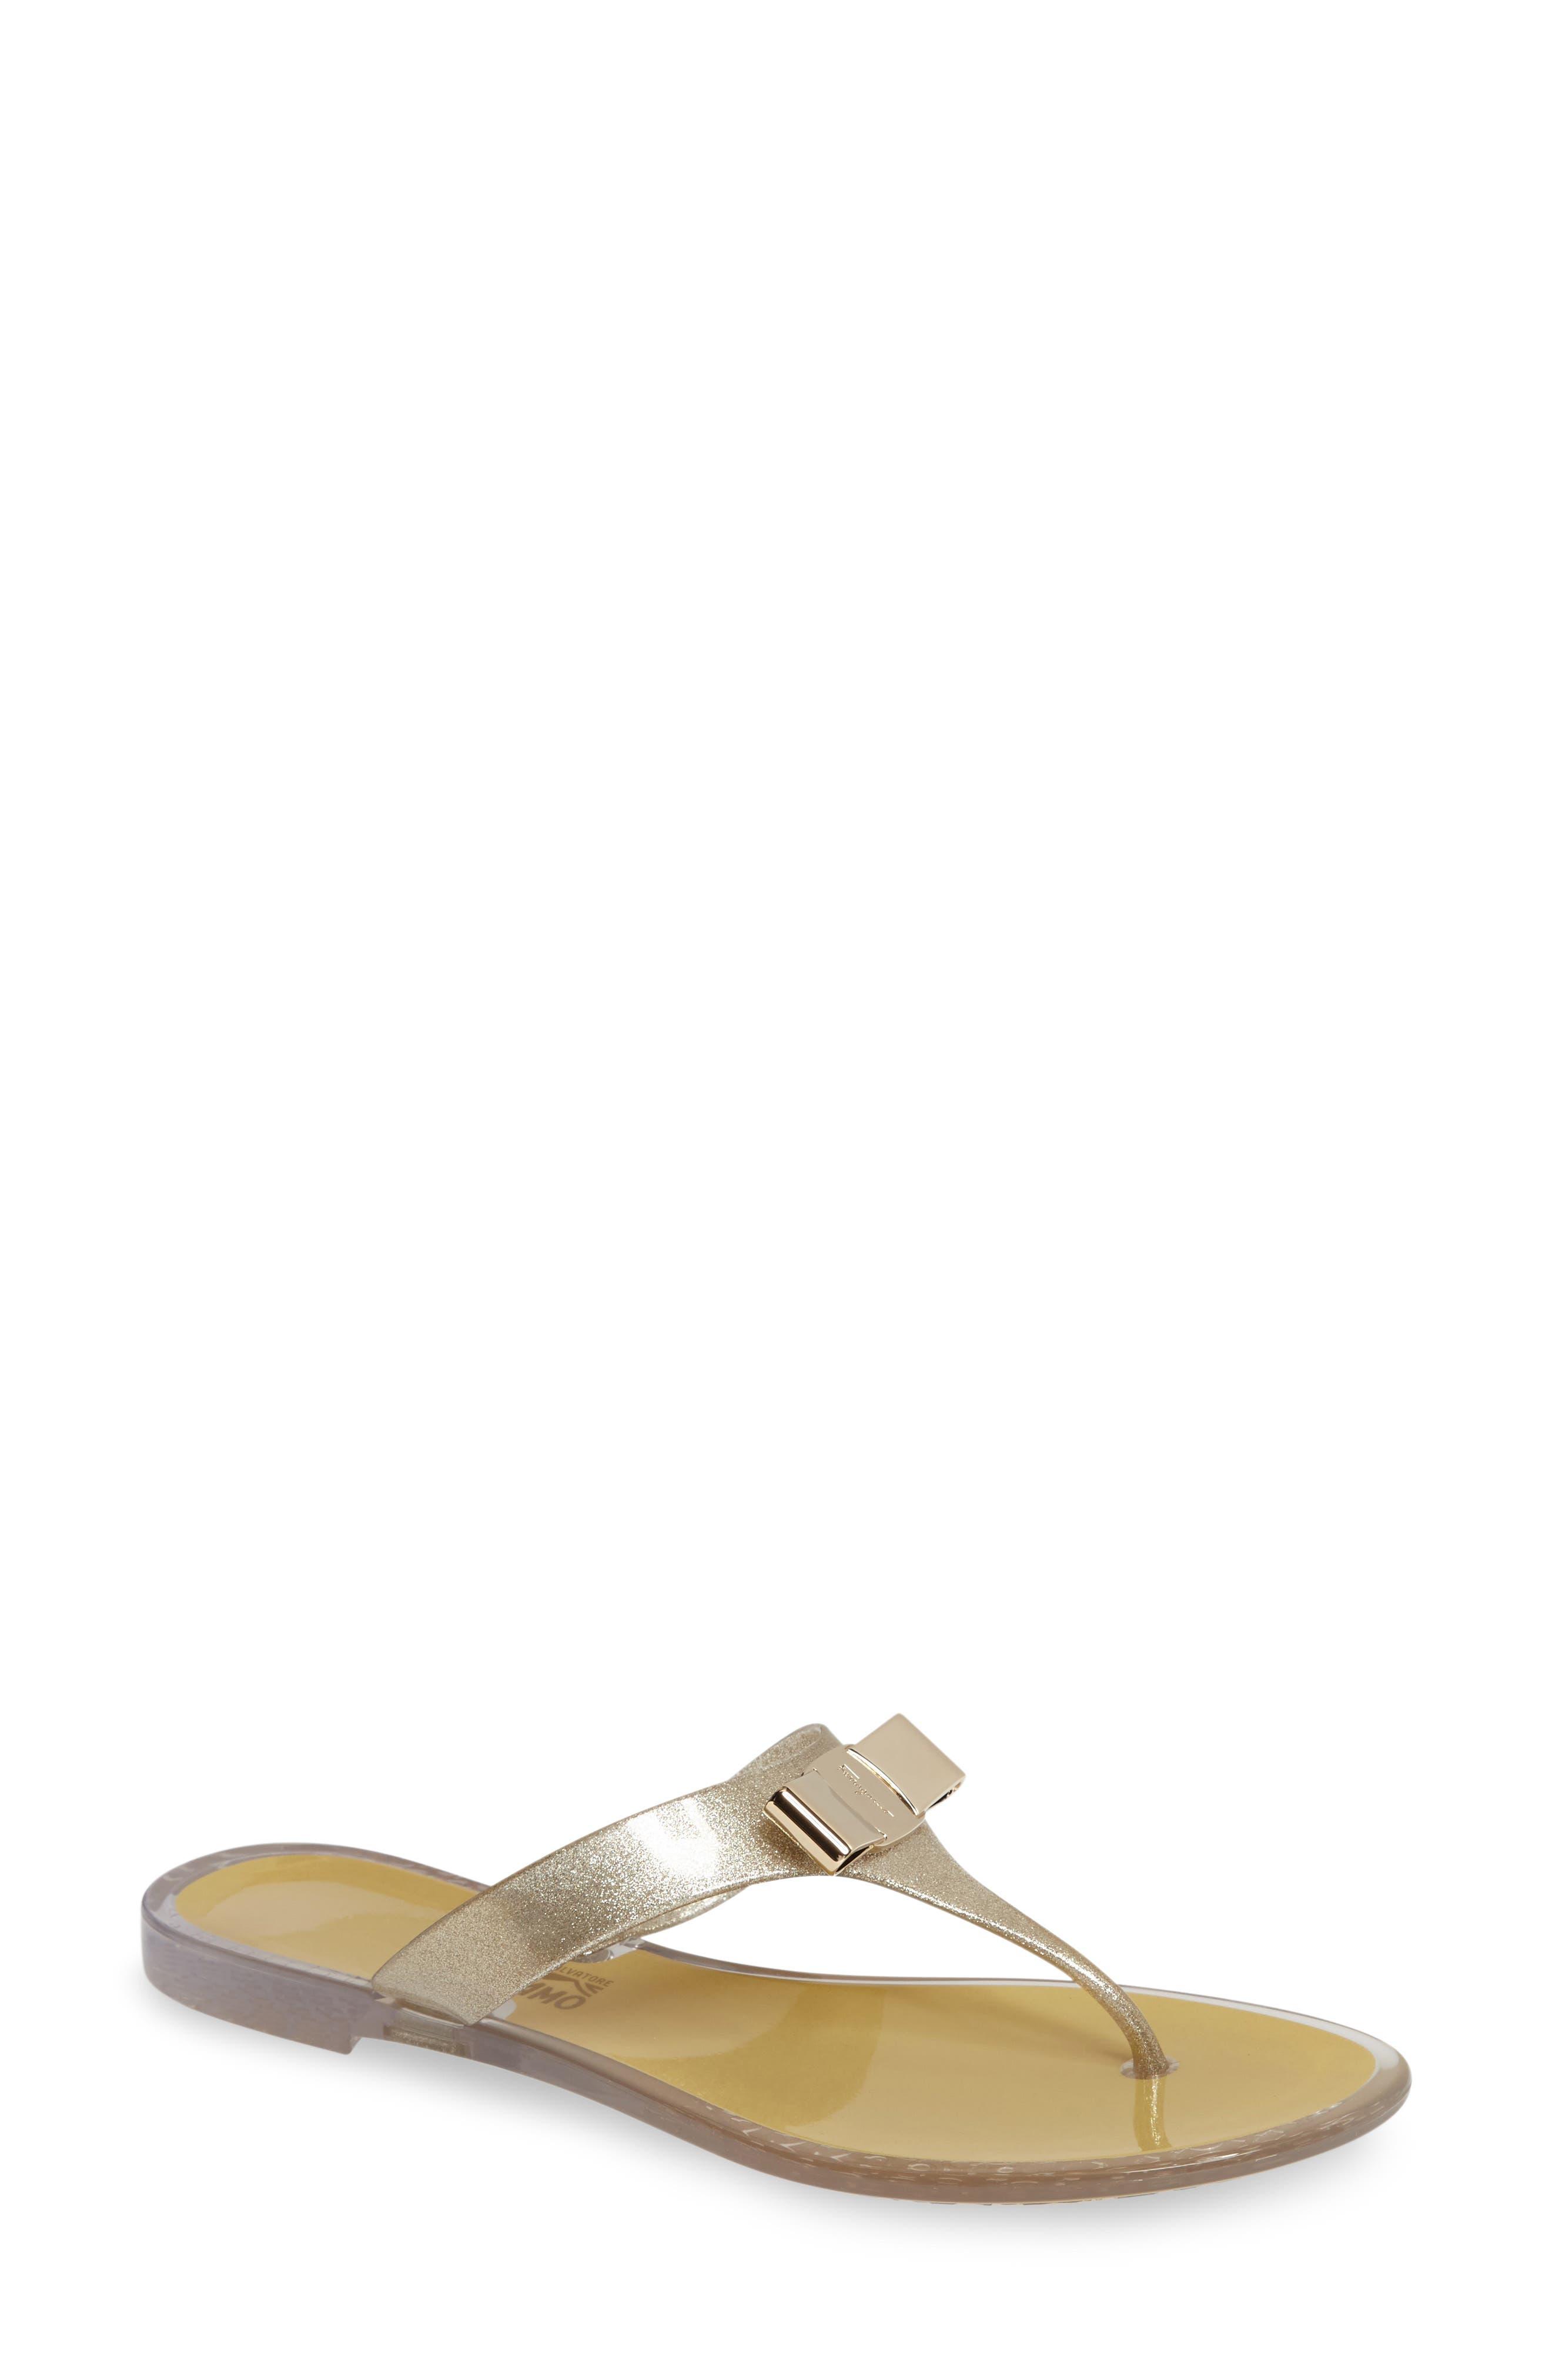 Jelly Flat Bow Sandal,                             Main thumbnail 1, color,